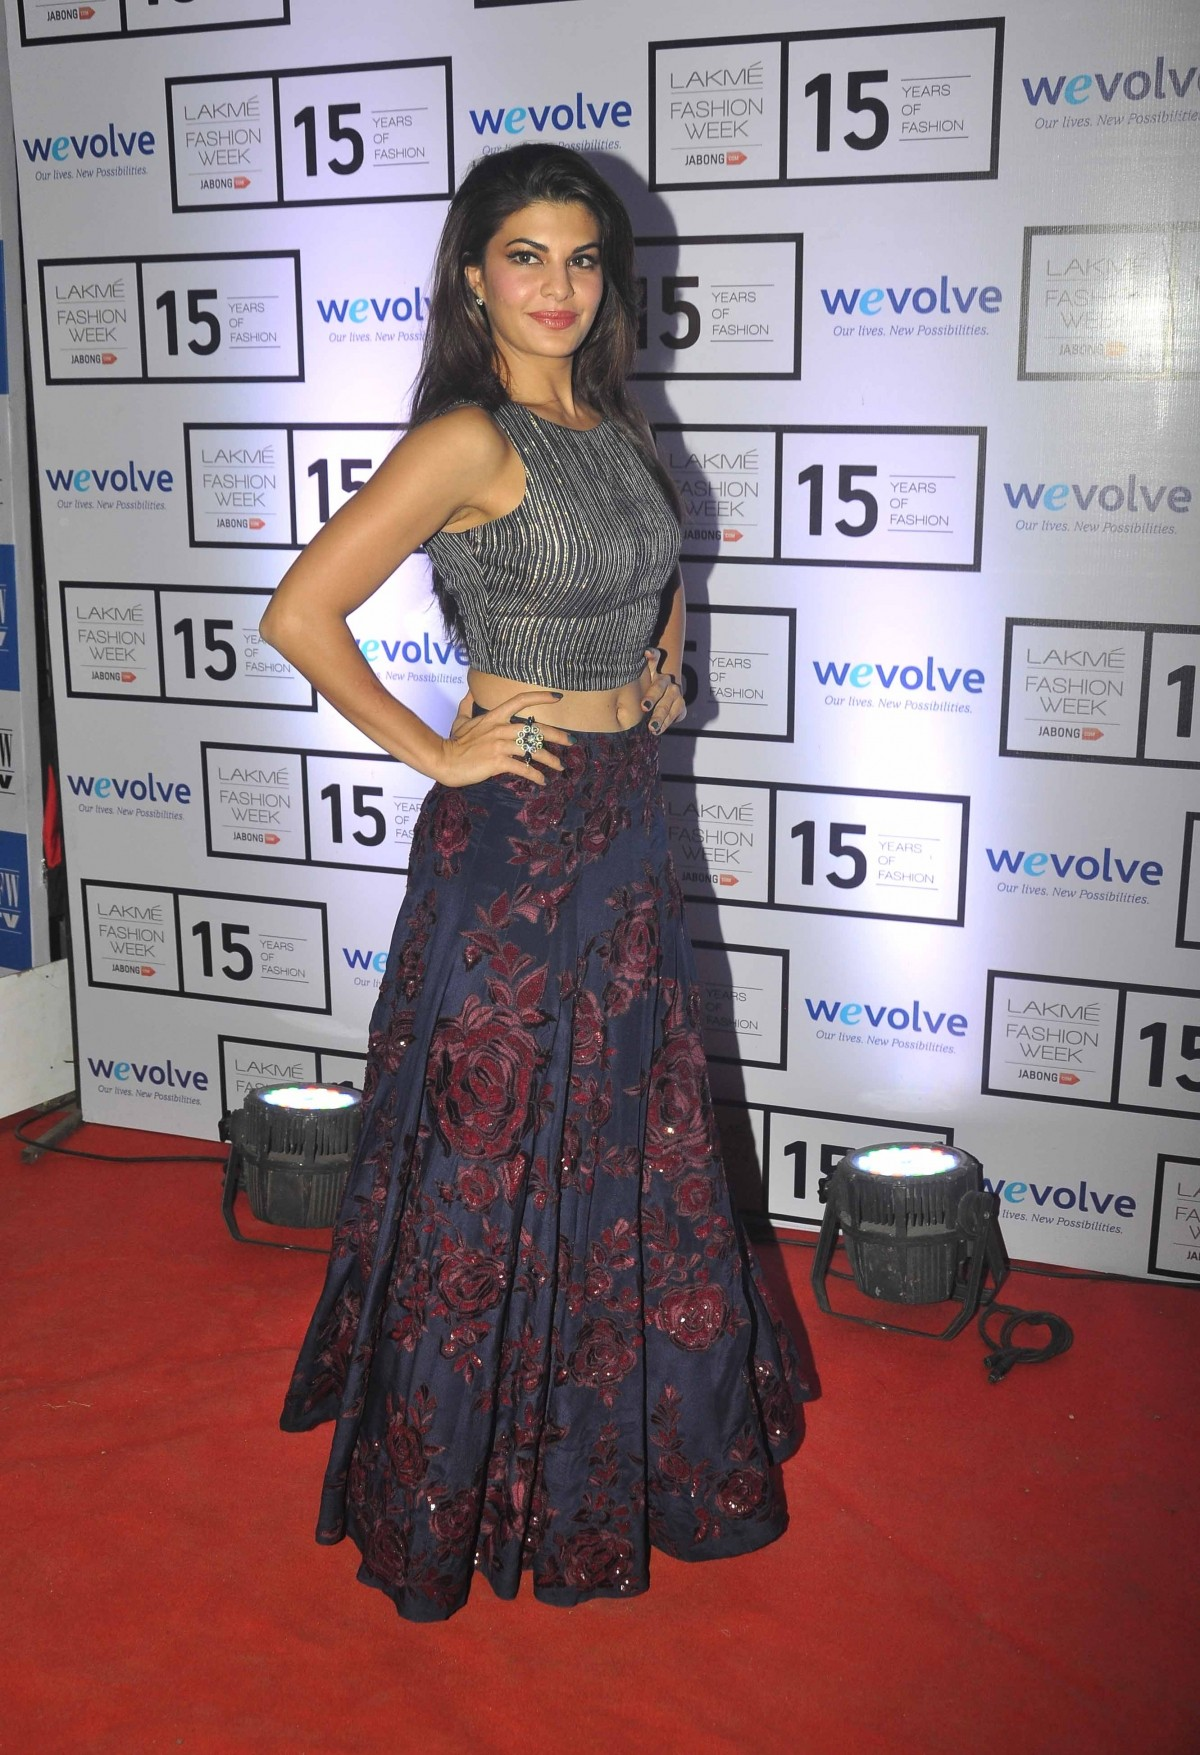 Lakme Fashion Week 2015: Jacqueline Fernandez, Deepika Padukone, Kajol Graces Manish Malhotra's Show [PHOTOS]